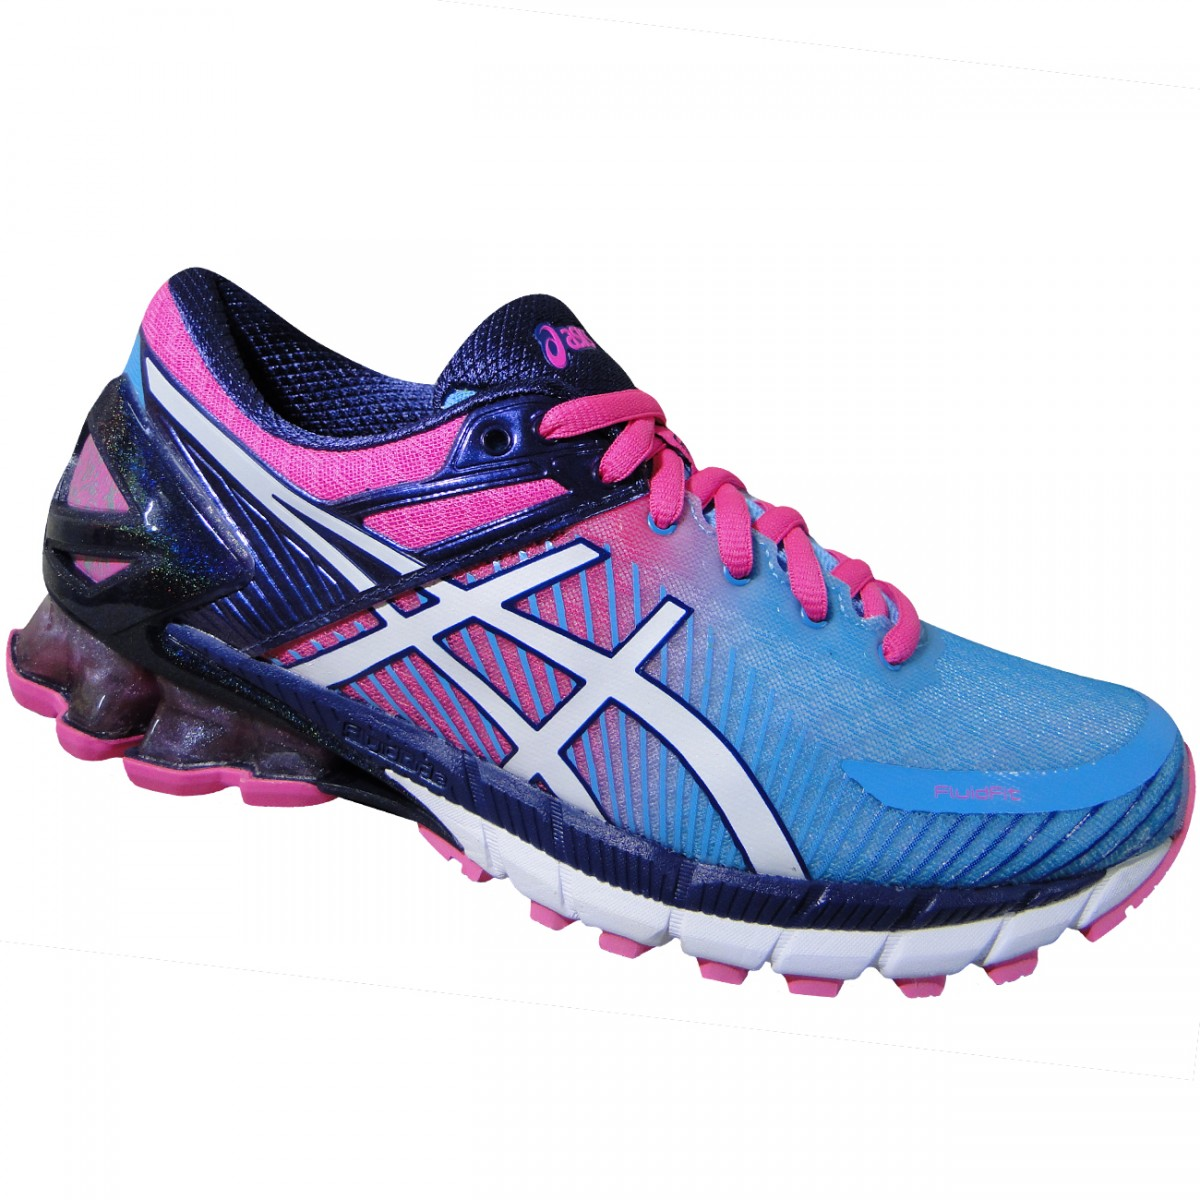 fdc3f3cc0fc Tenis Asics Gel-Kinsei 6 T694N 3901 - Azul Rosa Branco - Chuteira Nike